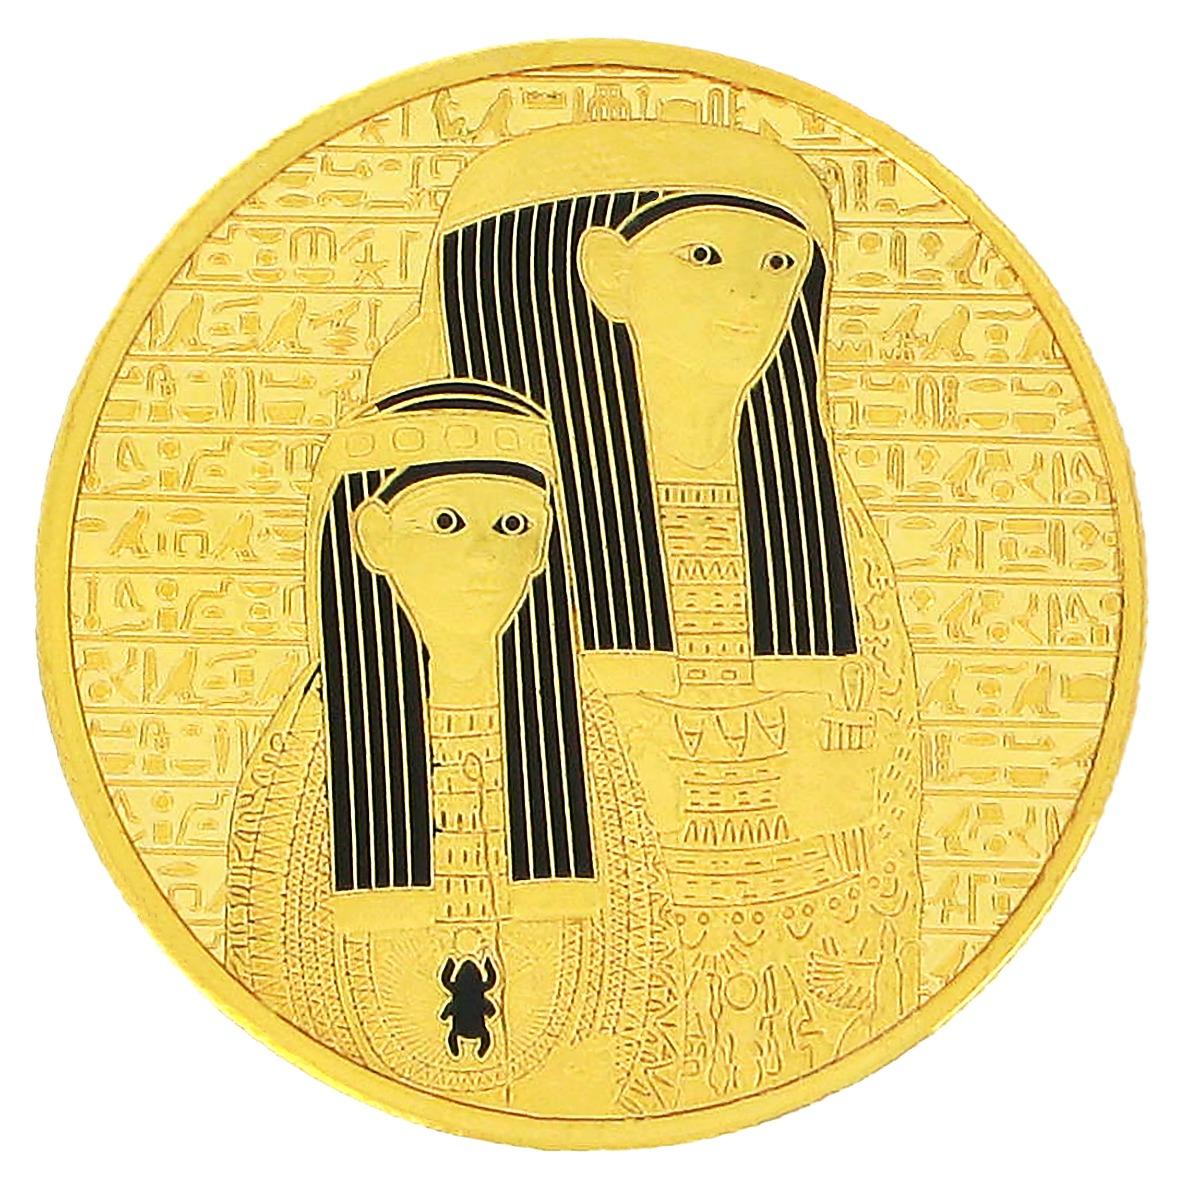 Mummy souvenir coin